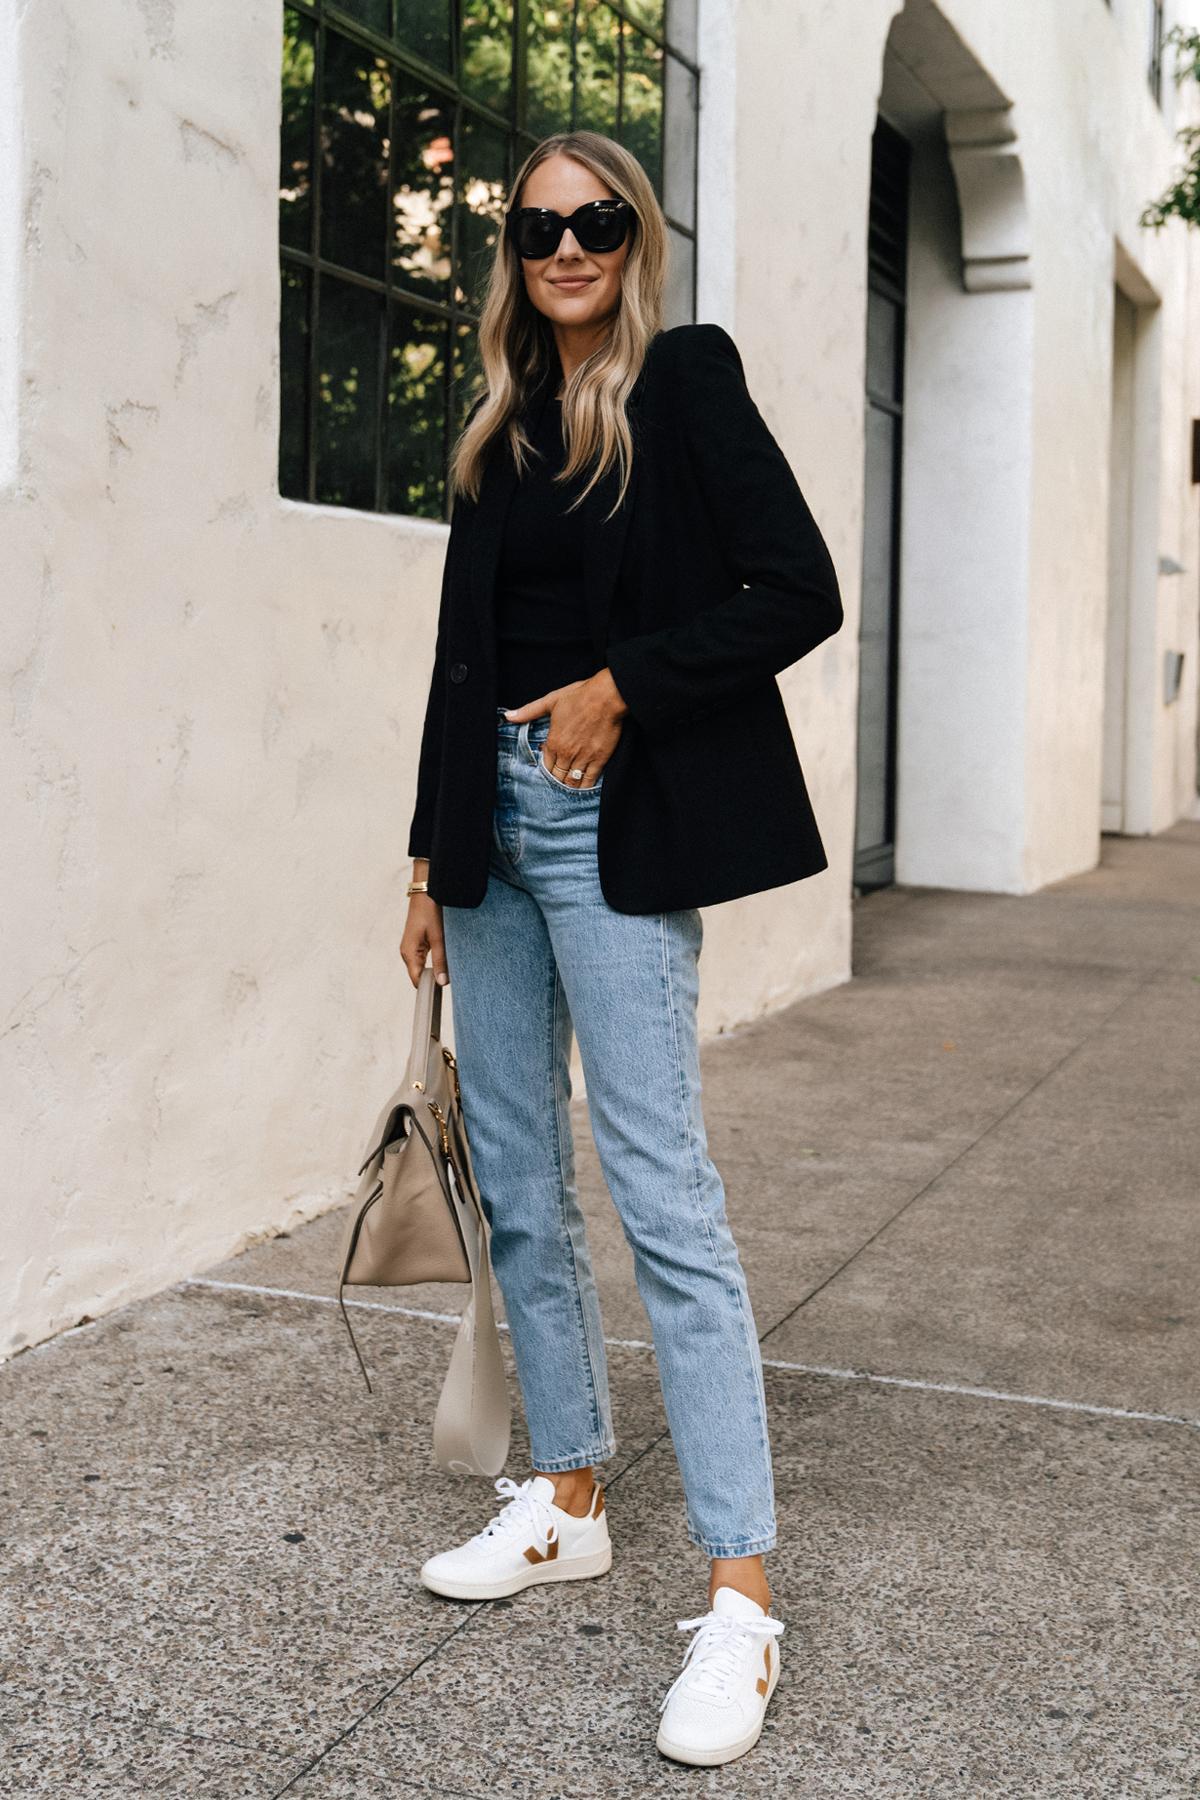 Fashion Jackson Wearing Anine Bing Black Blazer Levis Straight Leg jeans Veja V10 Camel White Sneakers Celine Mini Belt Bag Taupe Fall Outfit Street Style 1